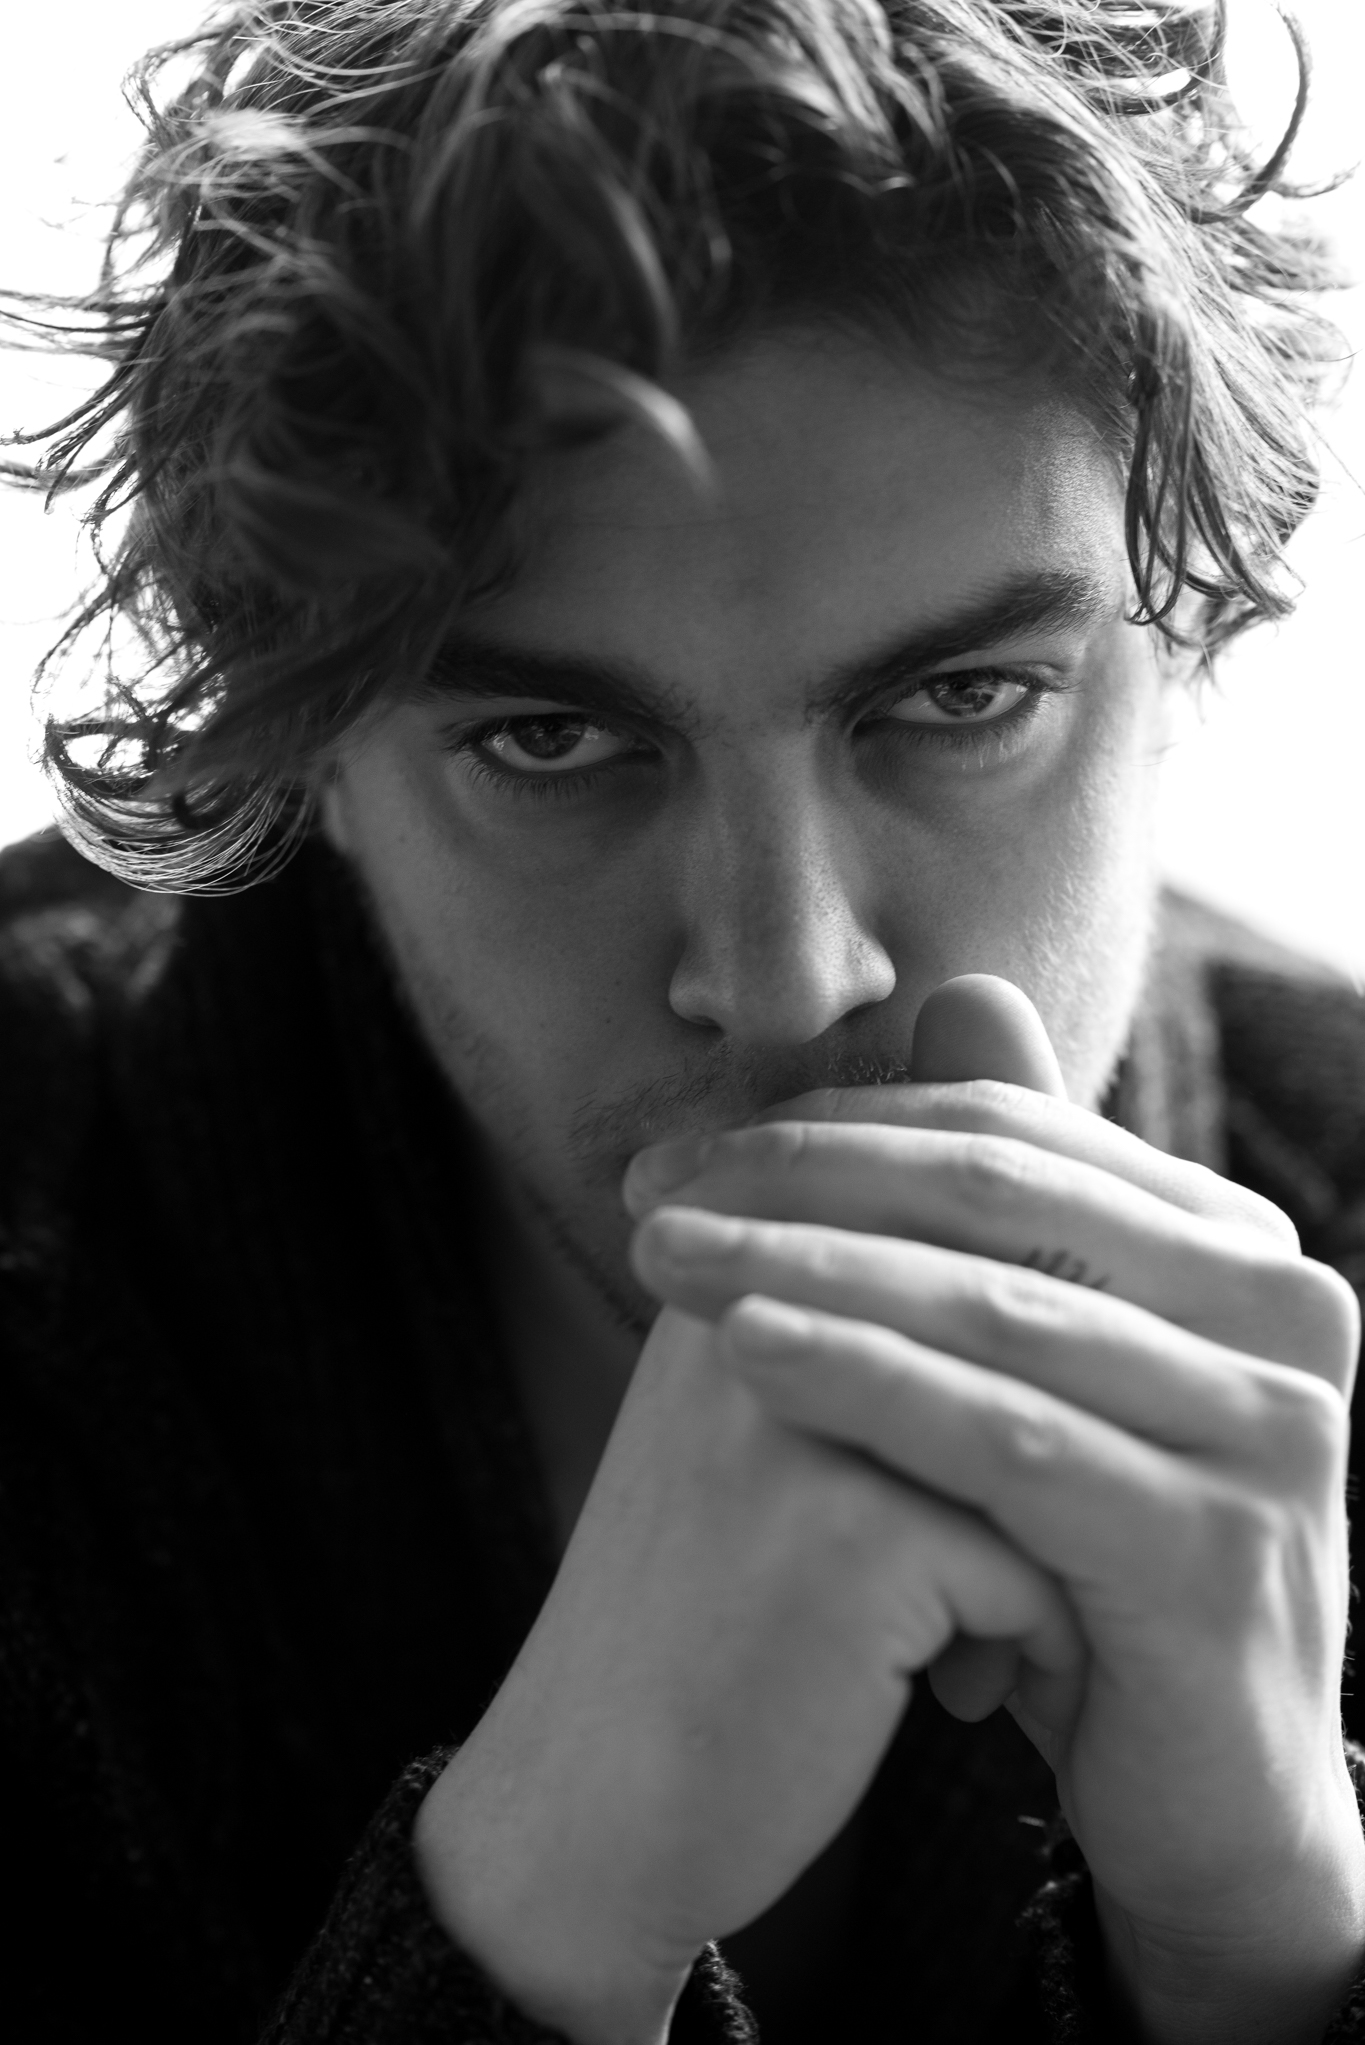 Adon Exclusive: Model MATT YOUNG By JONJIE BANIEL